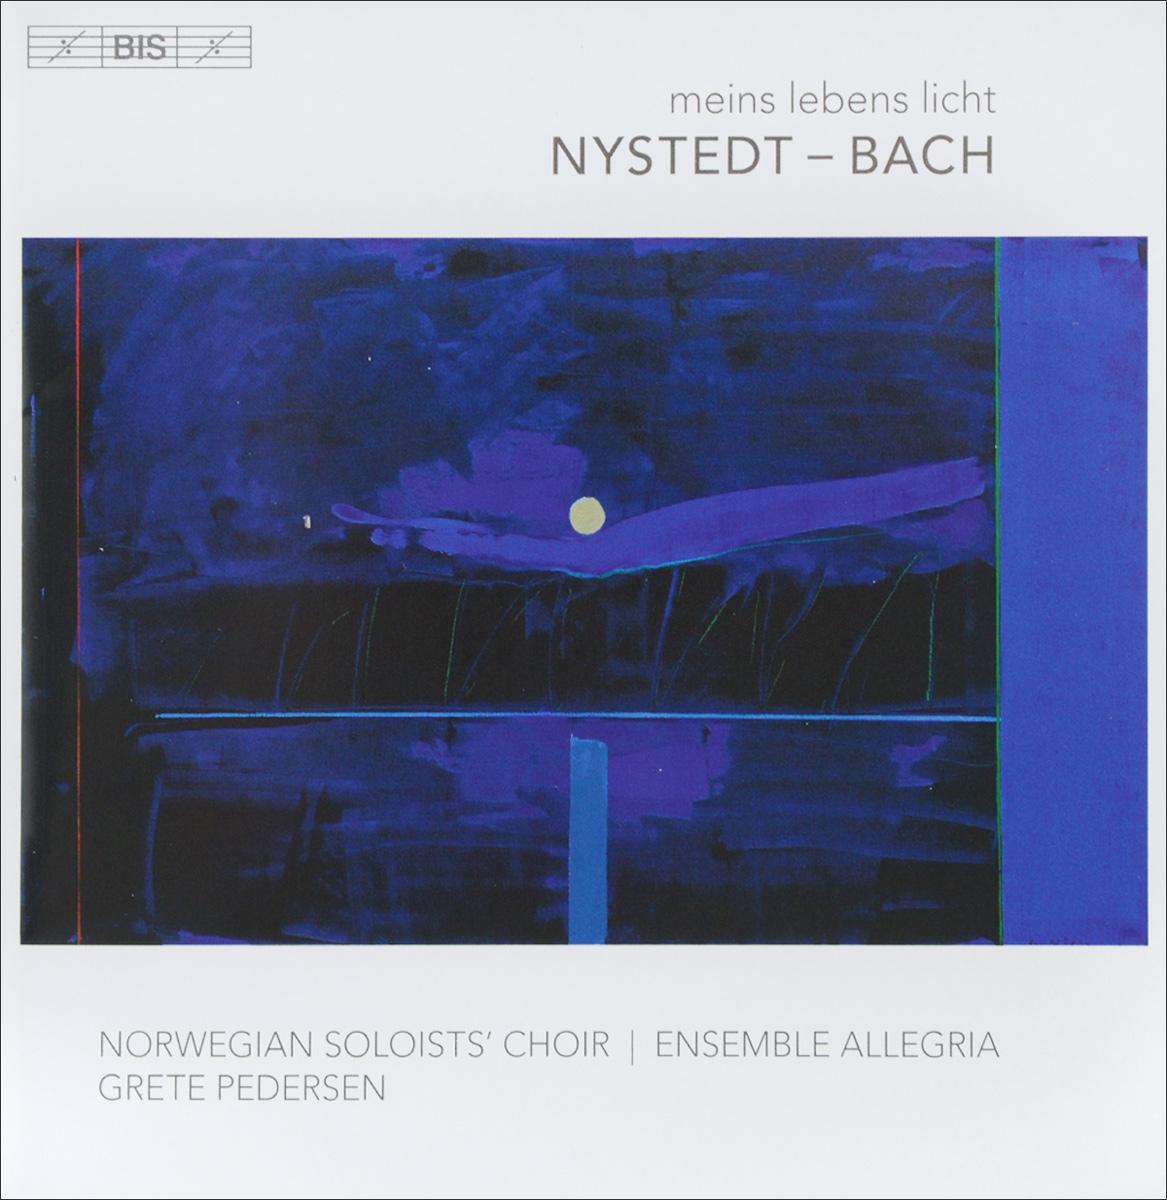 Грете Педерсен,Det Norske Solistkor,Maria Angelika Carlsen,Ensemble Allegria Grete Pedersen. Nystedt / Bach. Meins Lebens Licht (SACD) стоимость